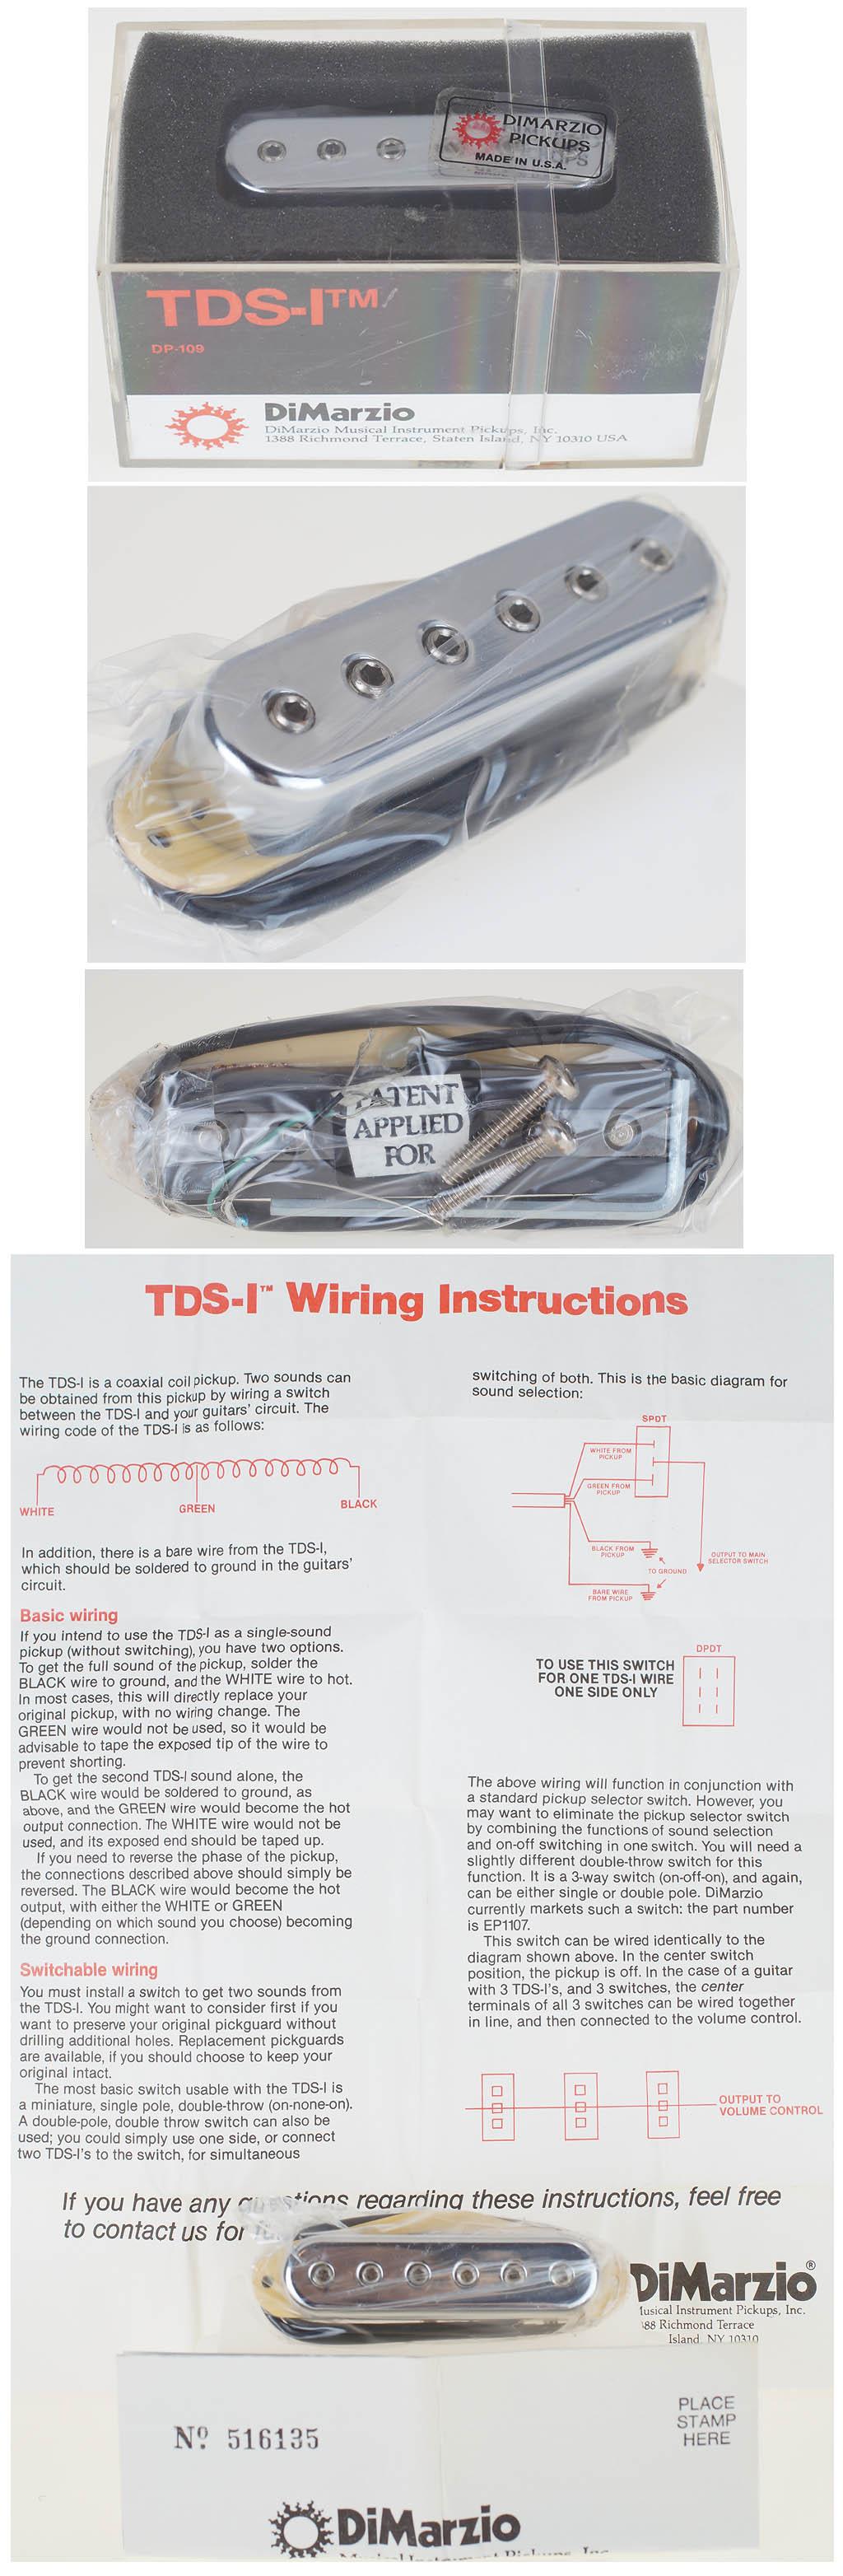 Dimarzio Pickup Single Coil Strat Tds 1 Dp 109 Pickups New Sealed Wiring Schematic Ebay